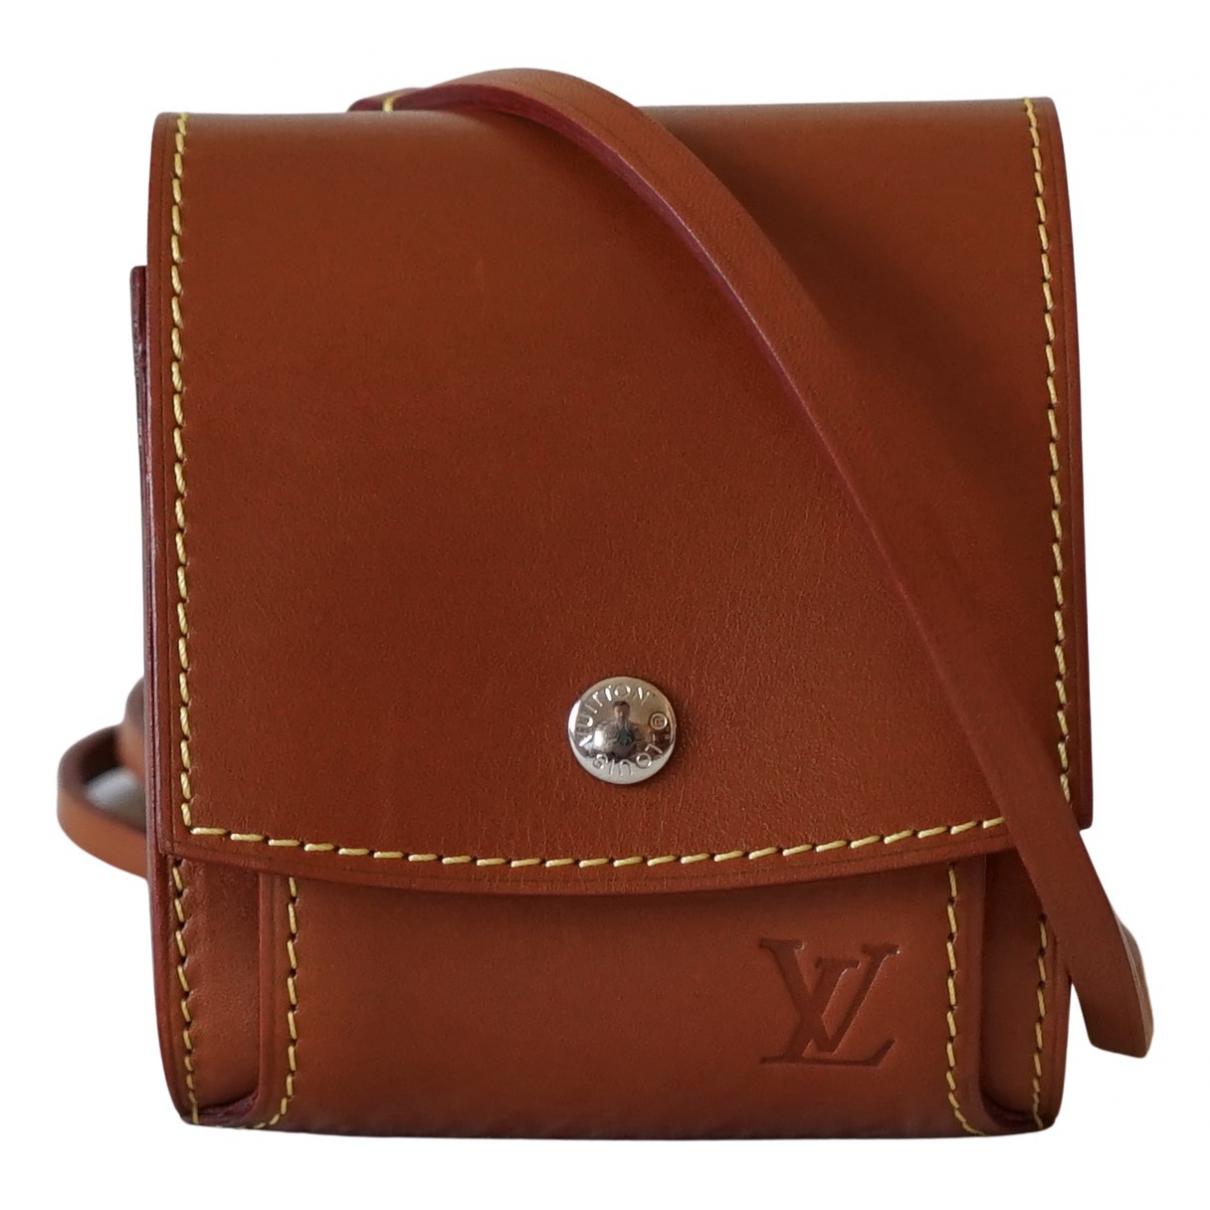 Louis Vuitton N Camel Leather handbag for Women N